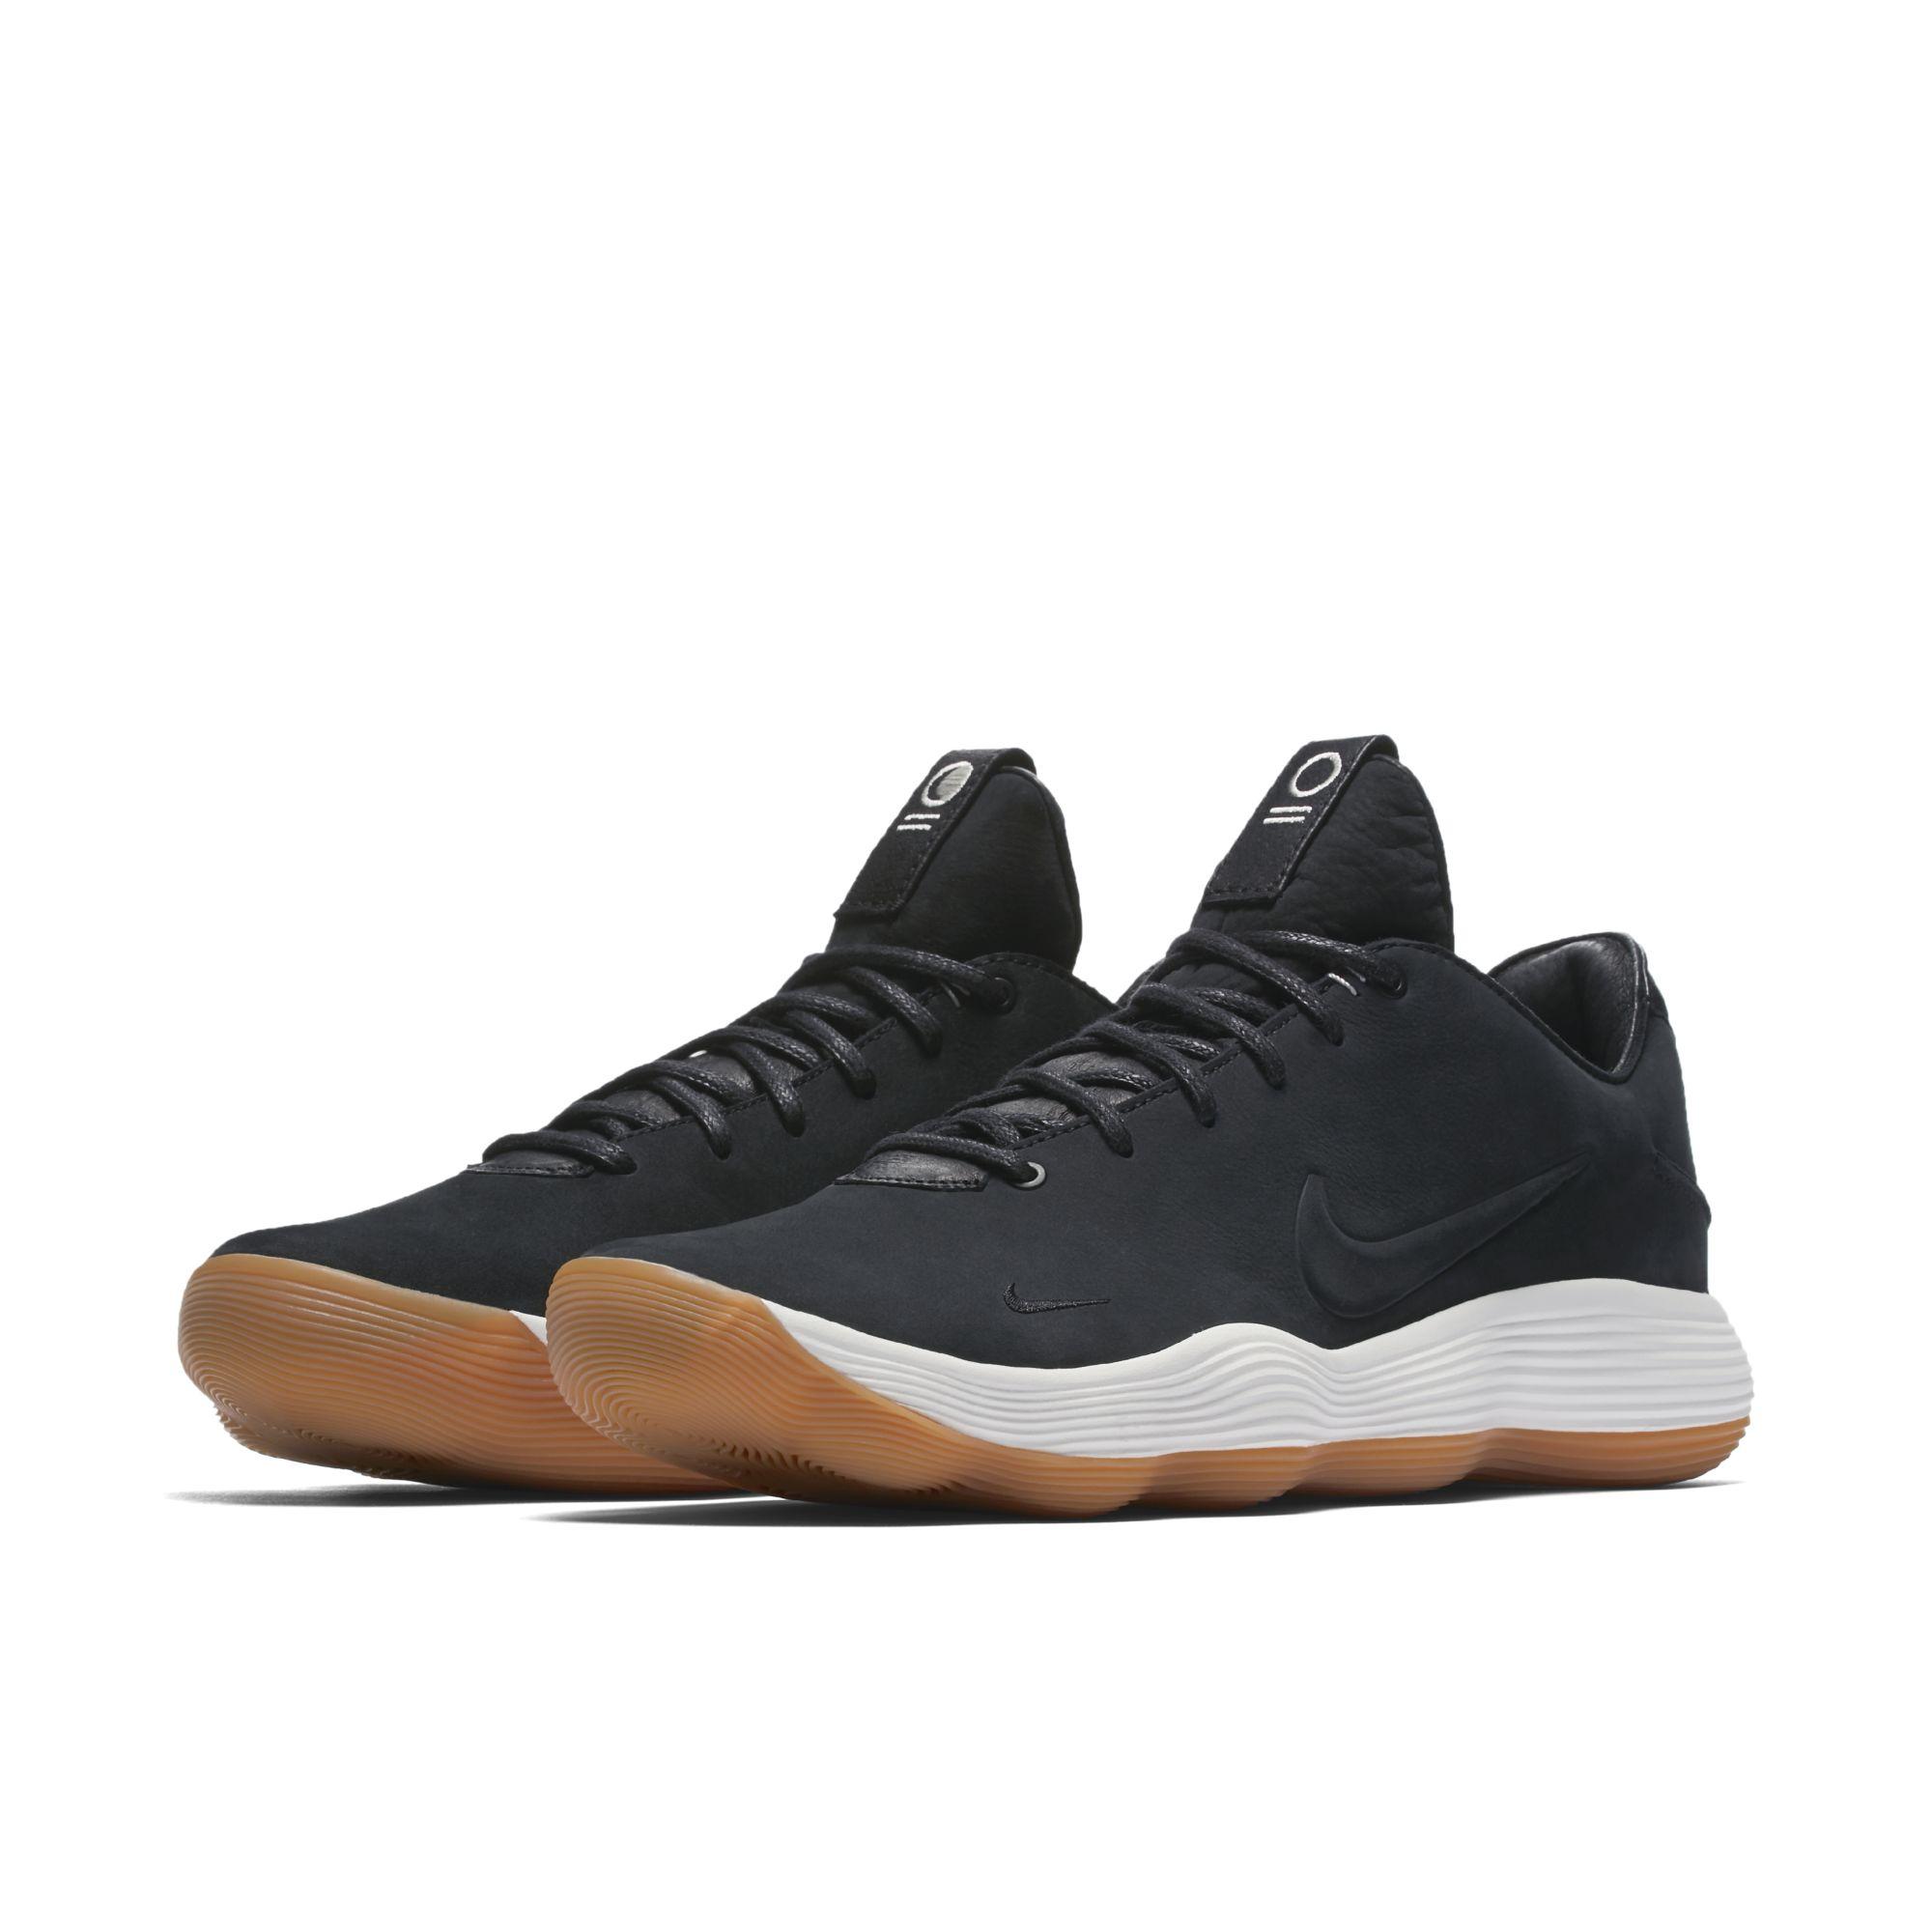 Detailed Look at the Premium Nike React